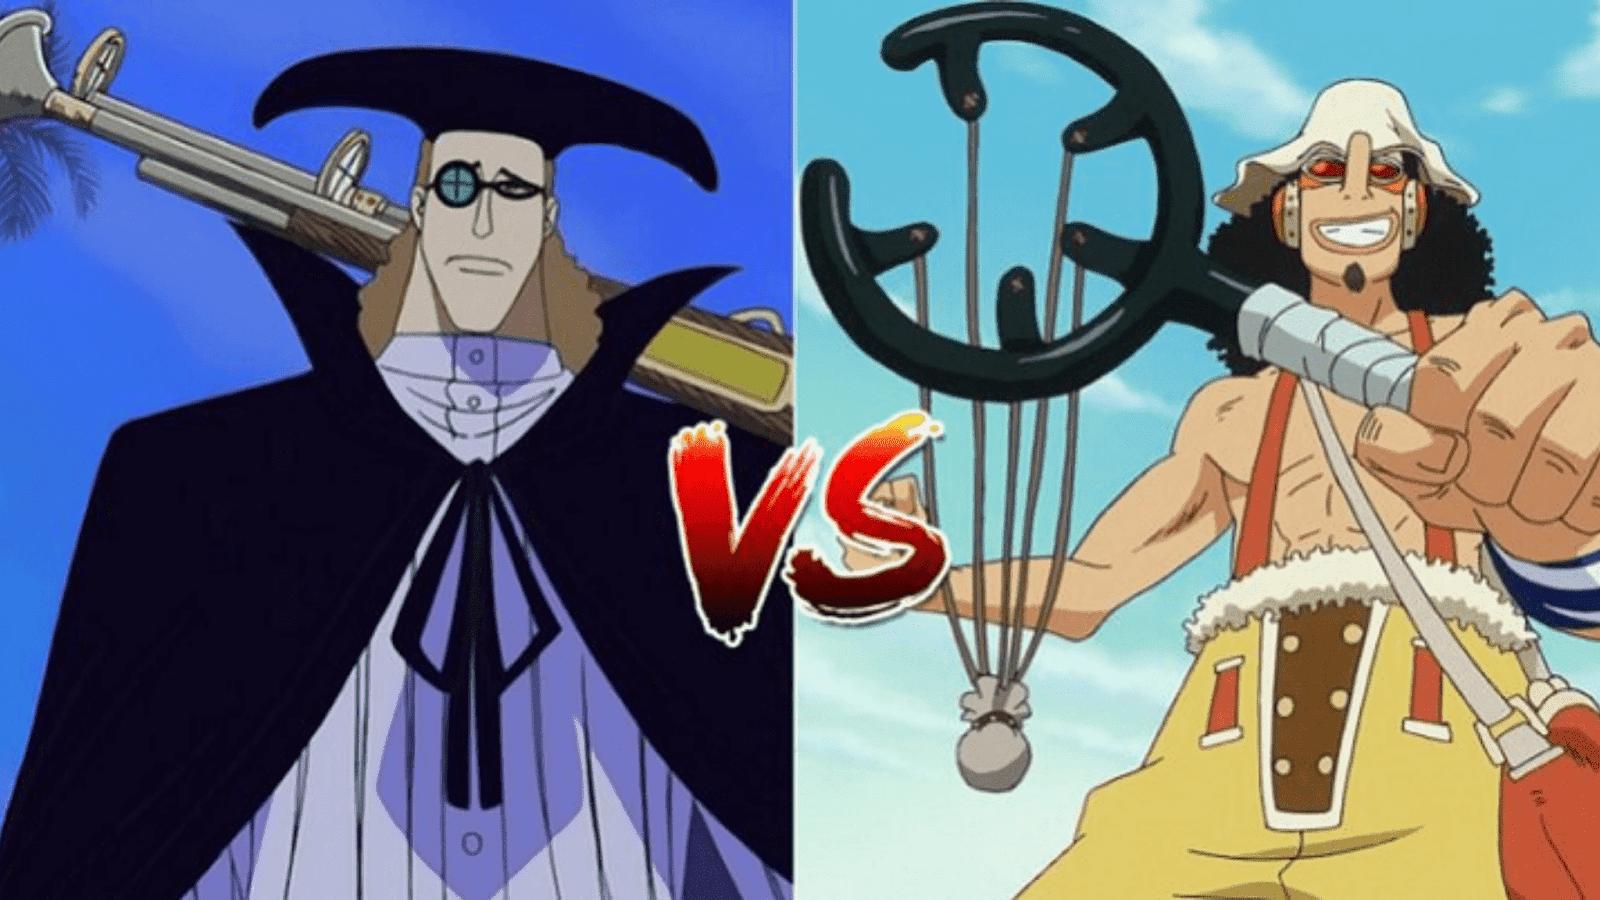 Van Augur vs Usopp